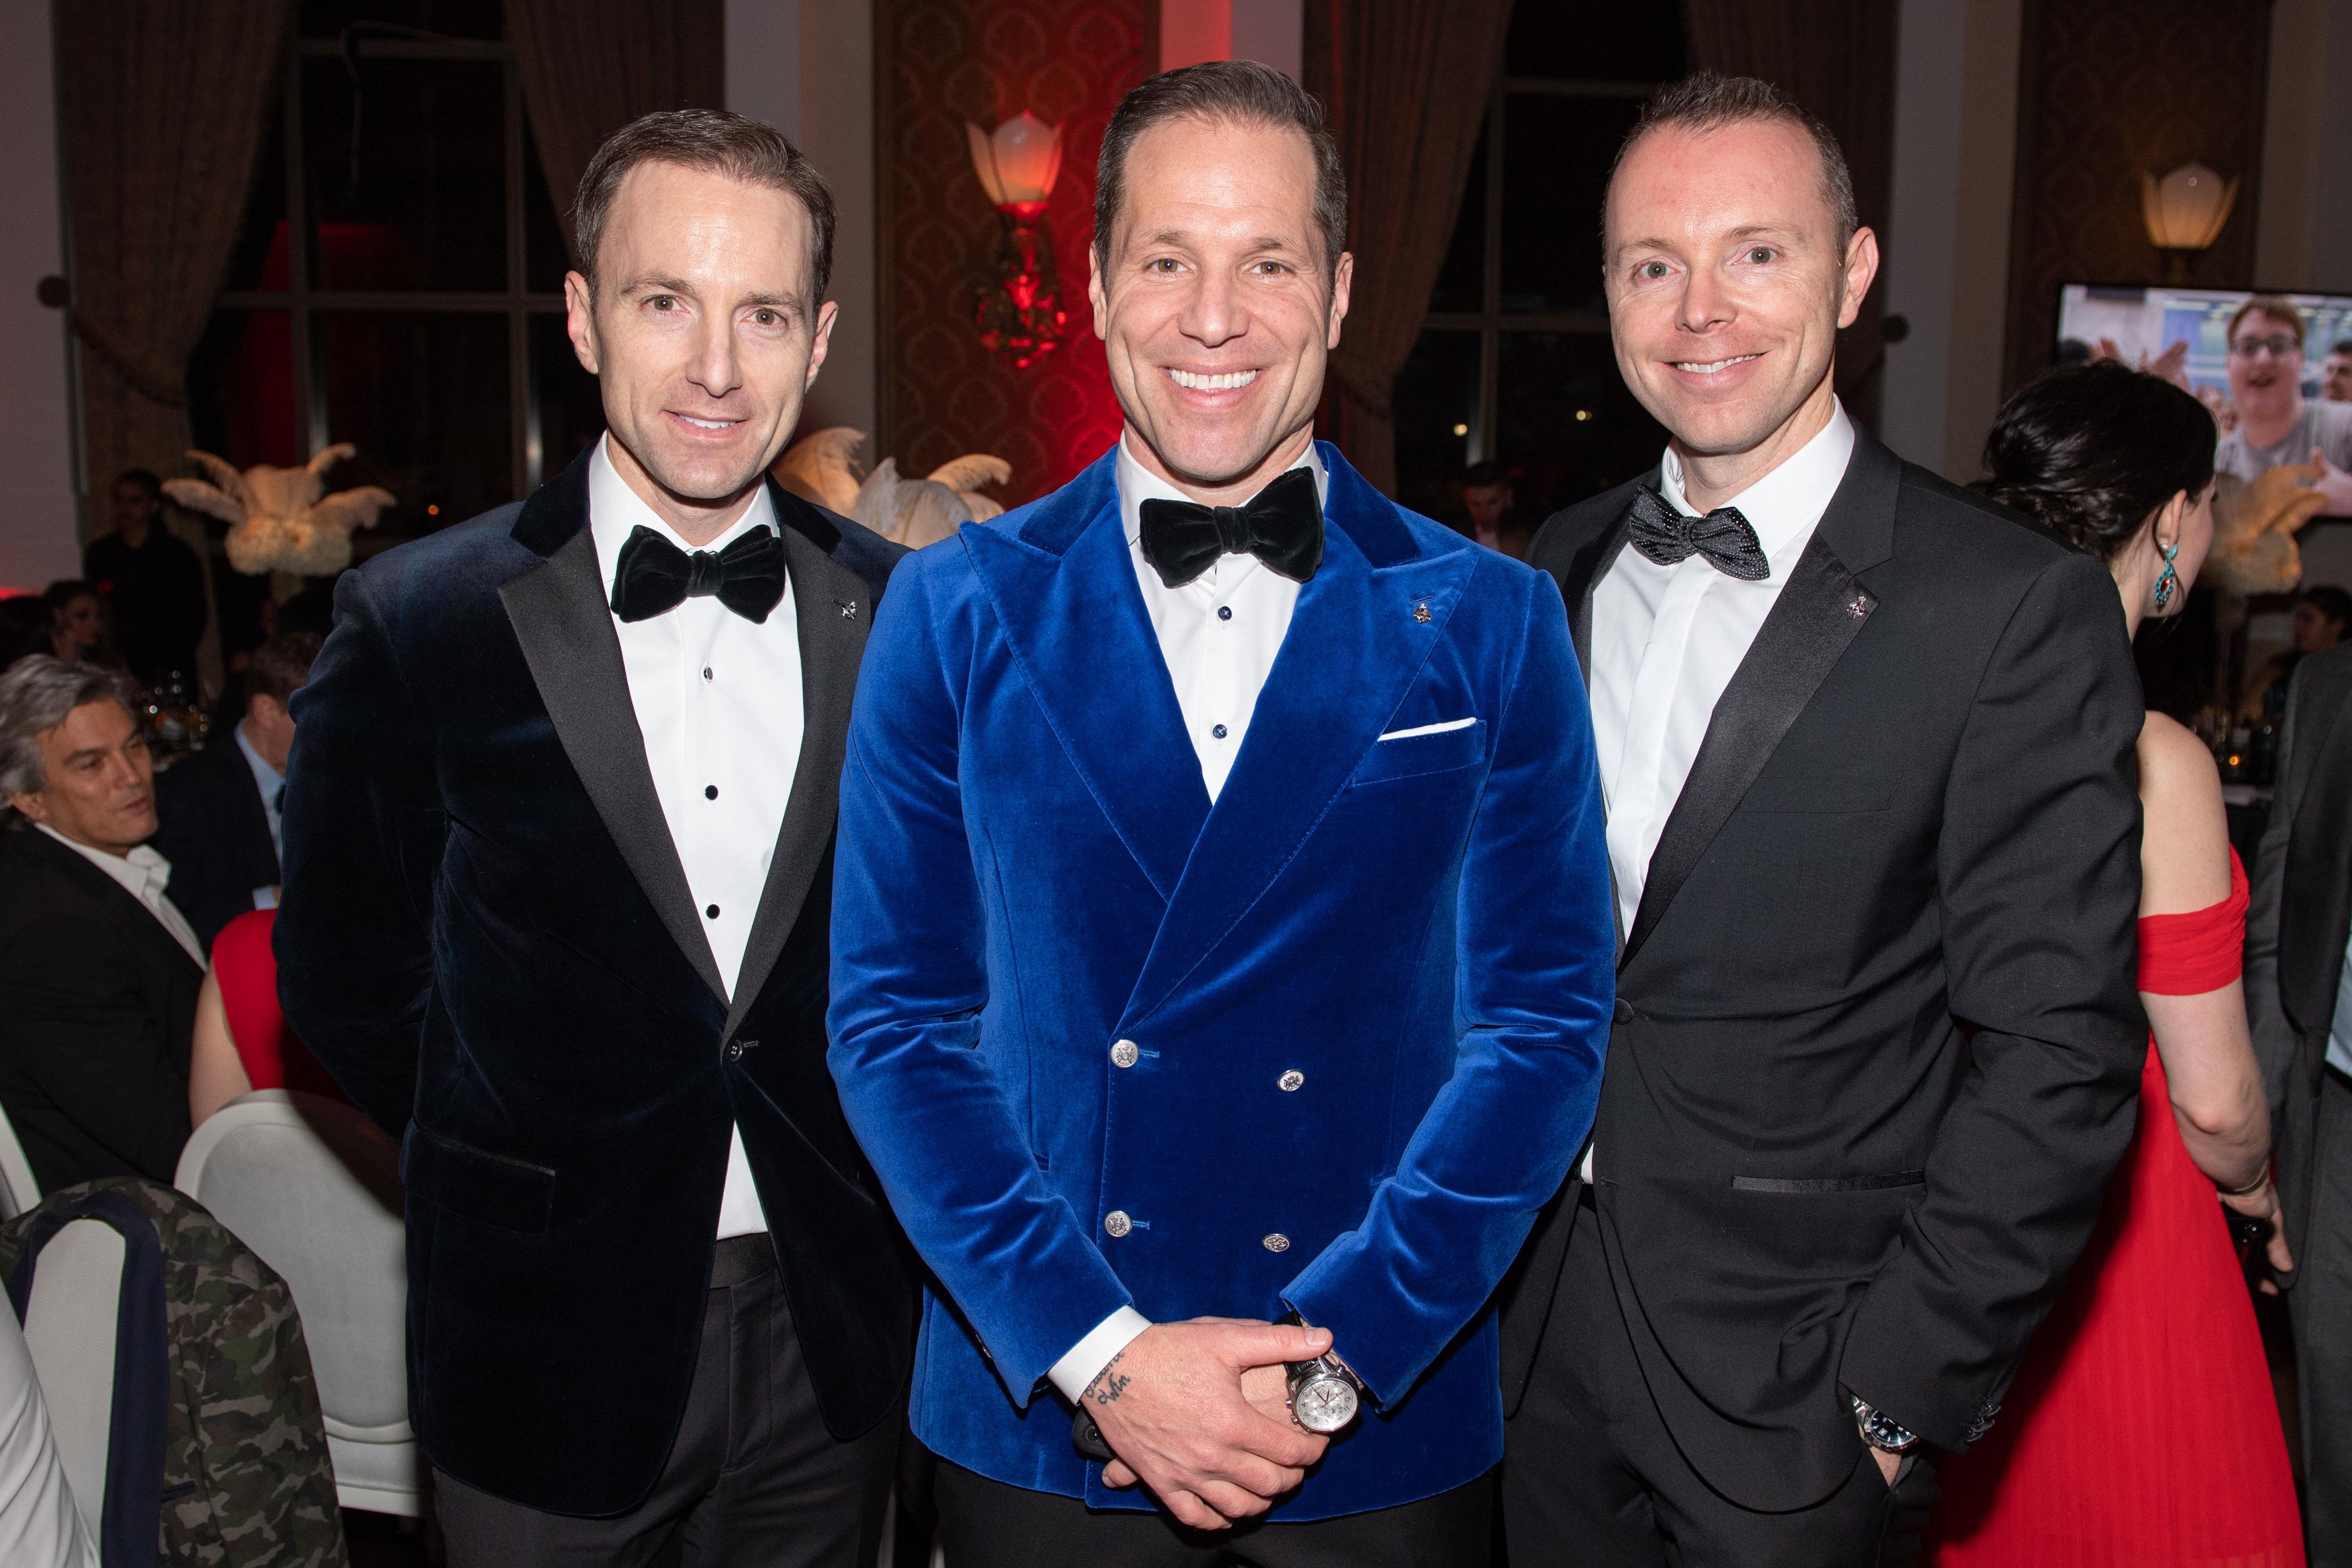 Sean, Paul, Mark Etherington